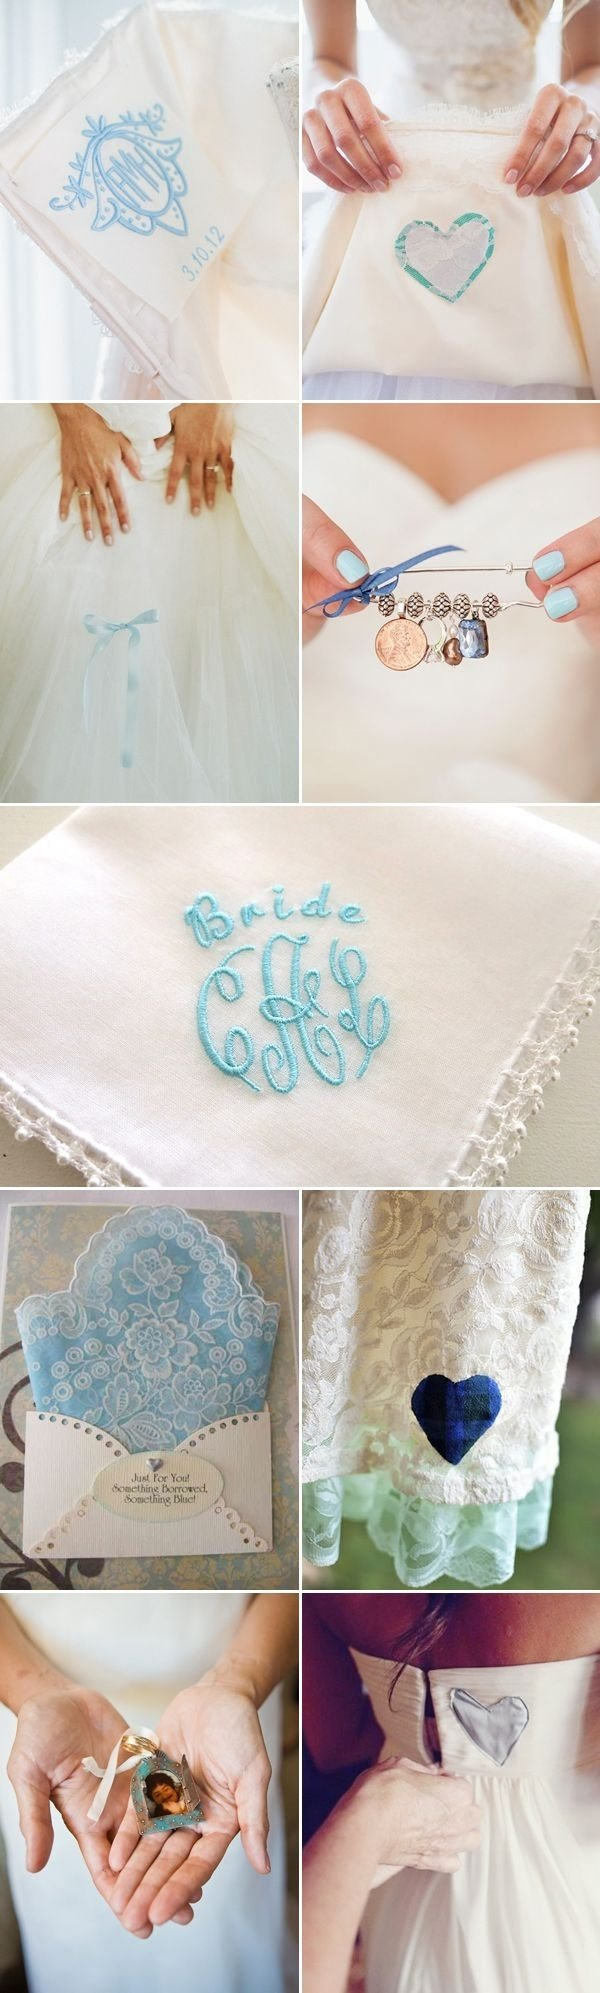 10 Fabulous Something Borrowed Ideas For Bride 23 best something blue for bride images on pinterest something 2020